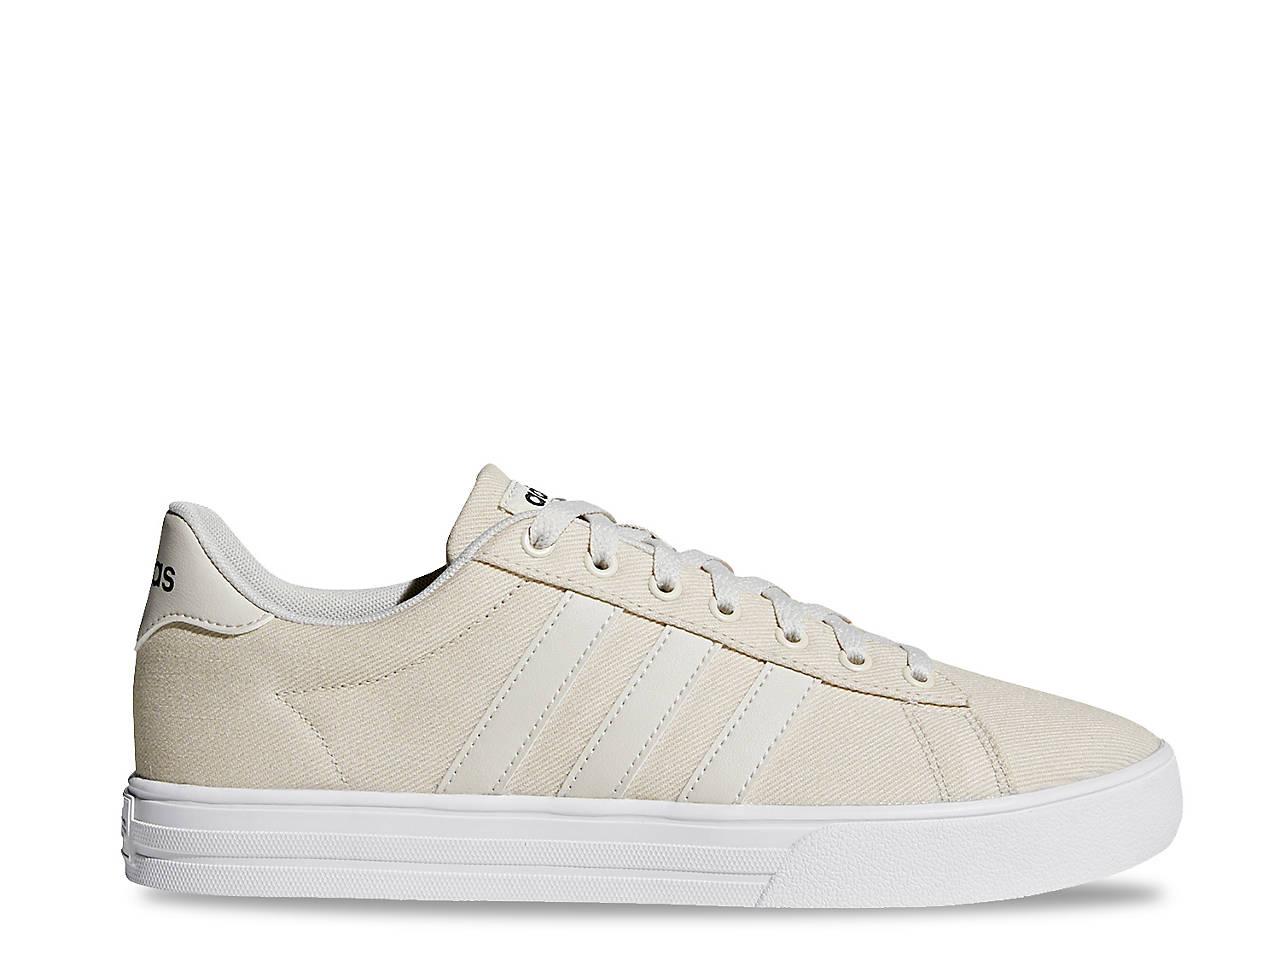 adidas Daily 2.0 Sneaker Men's Men's Shoes | DSW